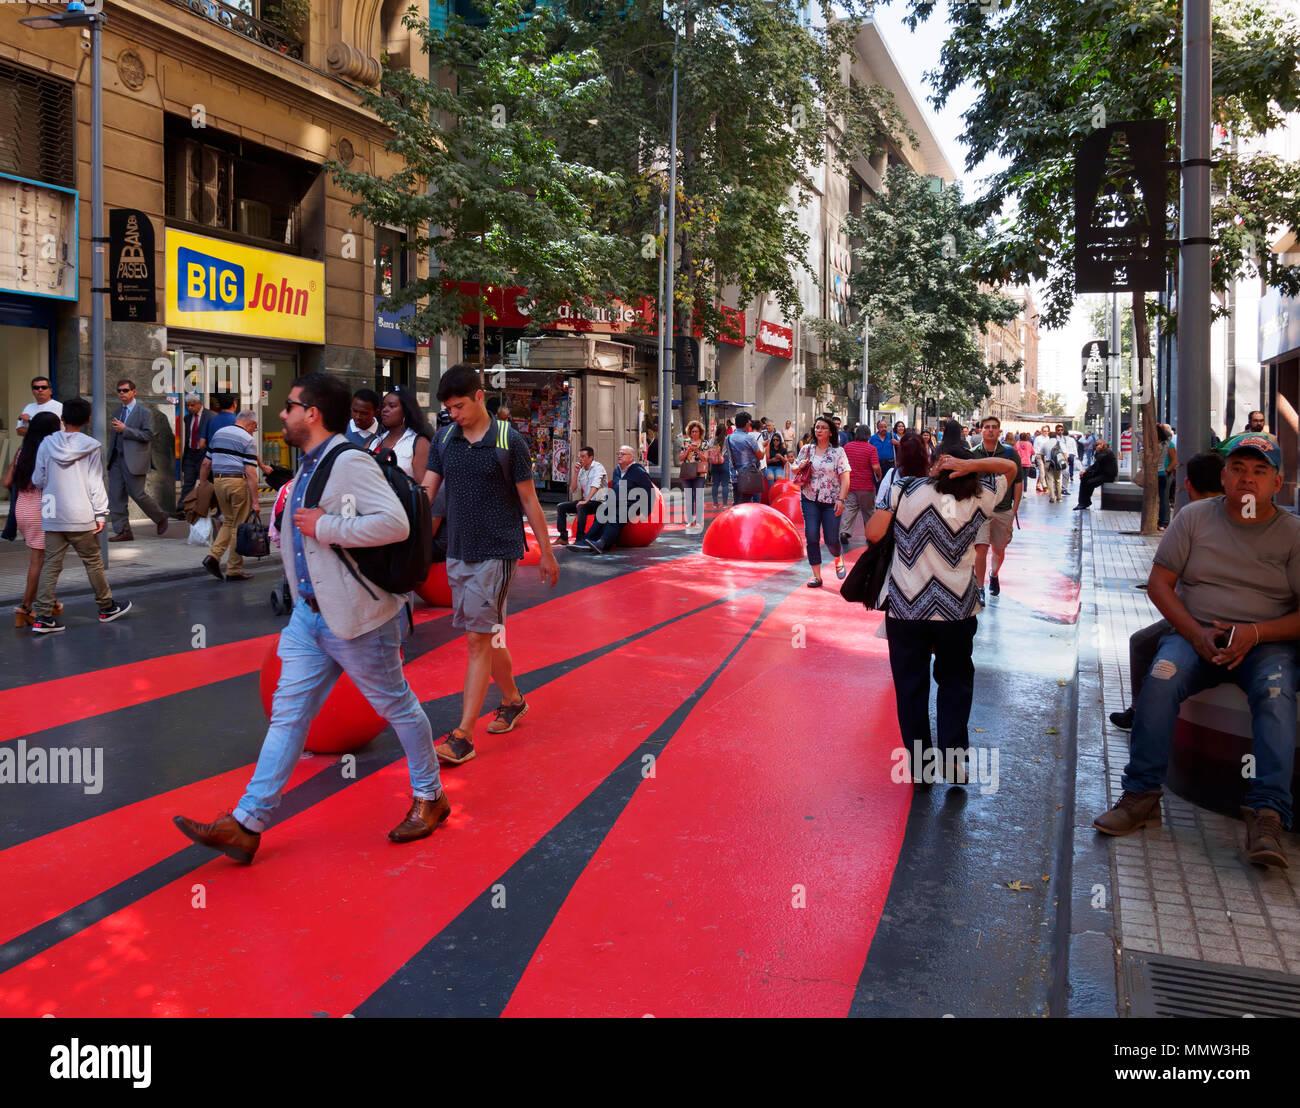 Pedestrianized street, Santiago, Chile - Stock Image